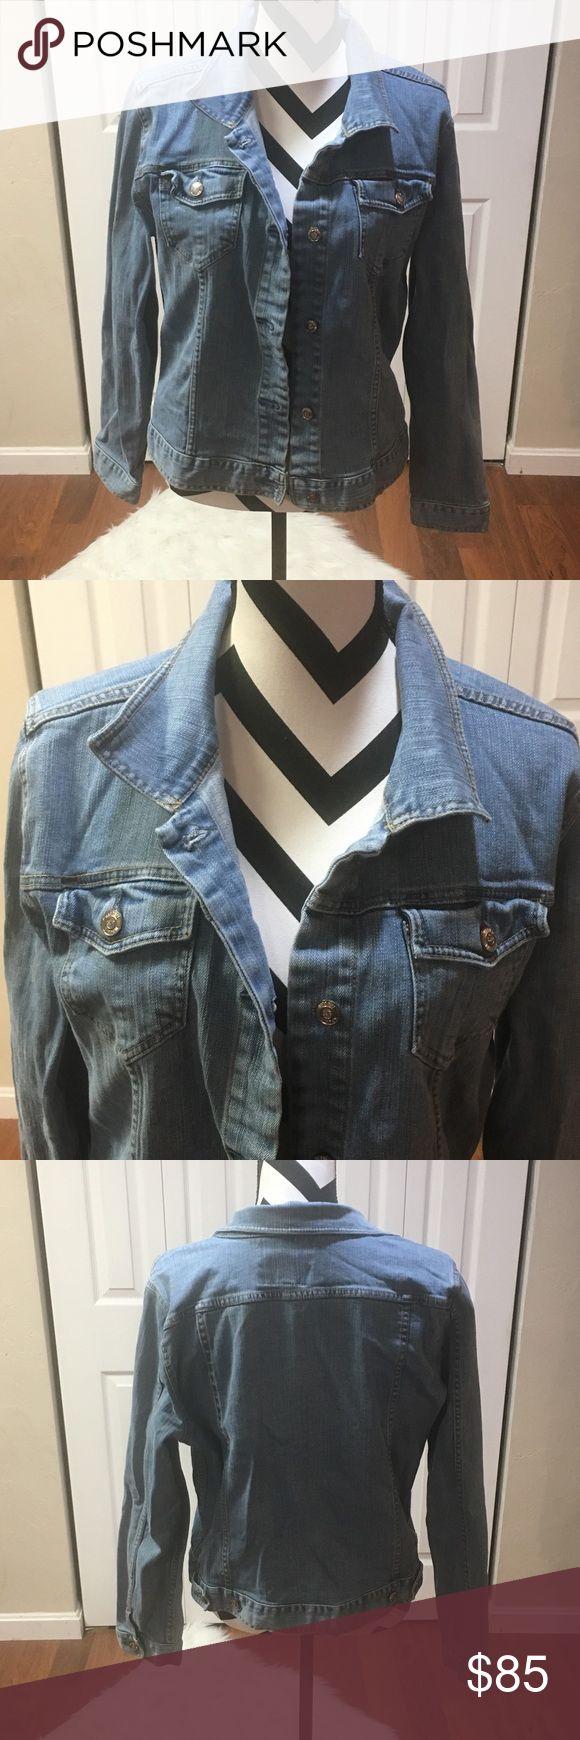 Plus size denim jean jacket xxl Plus size denim Jean jacket xxl 💗good condition💗🍁🍂nice for the Fall🍁🍂 SJP by Sarah Jessica Parker Jackets & Coats Jean Jackets